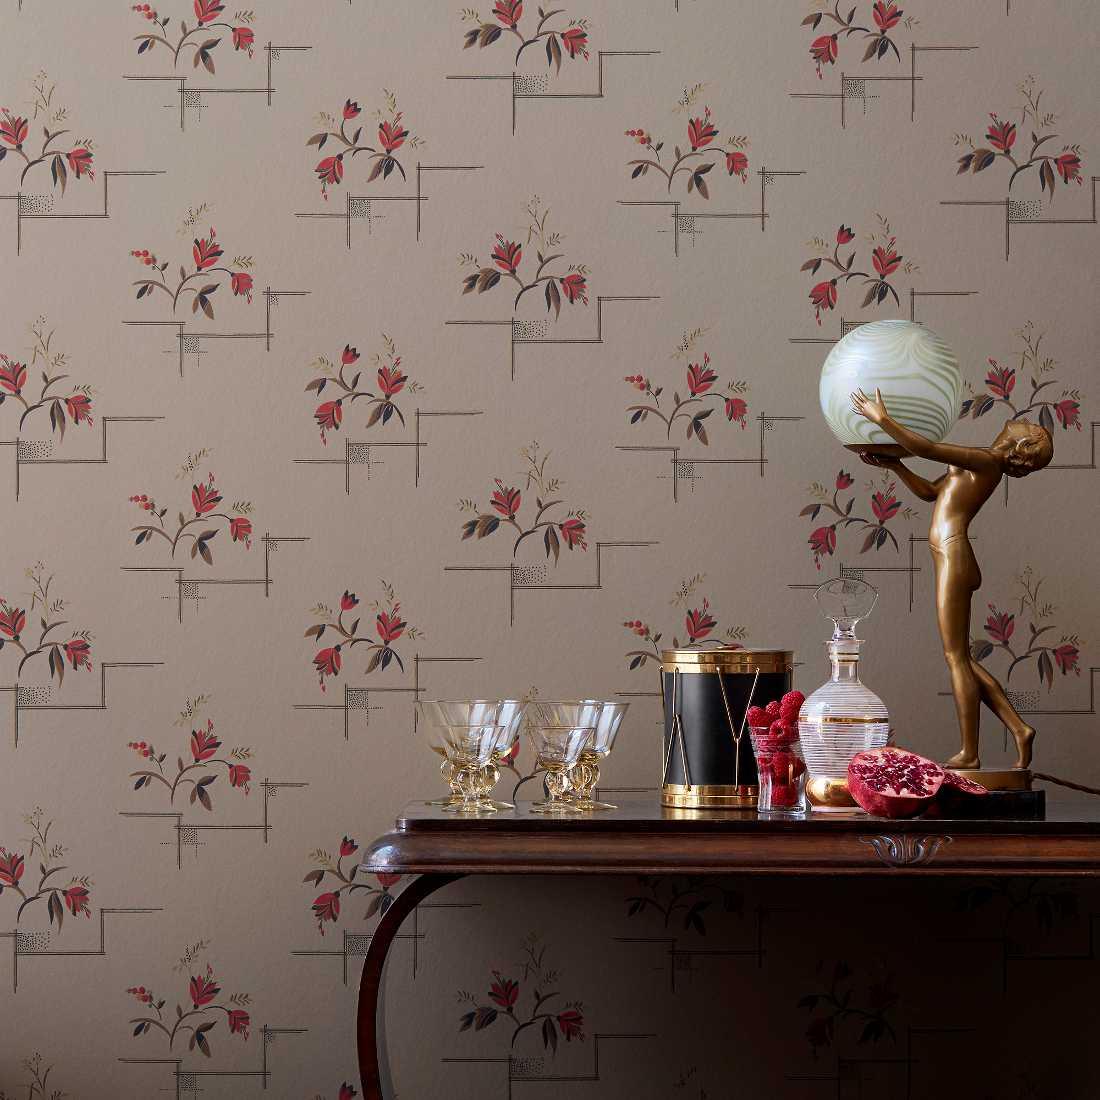 katarina_sandberg_wallpaper